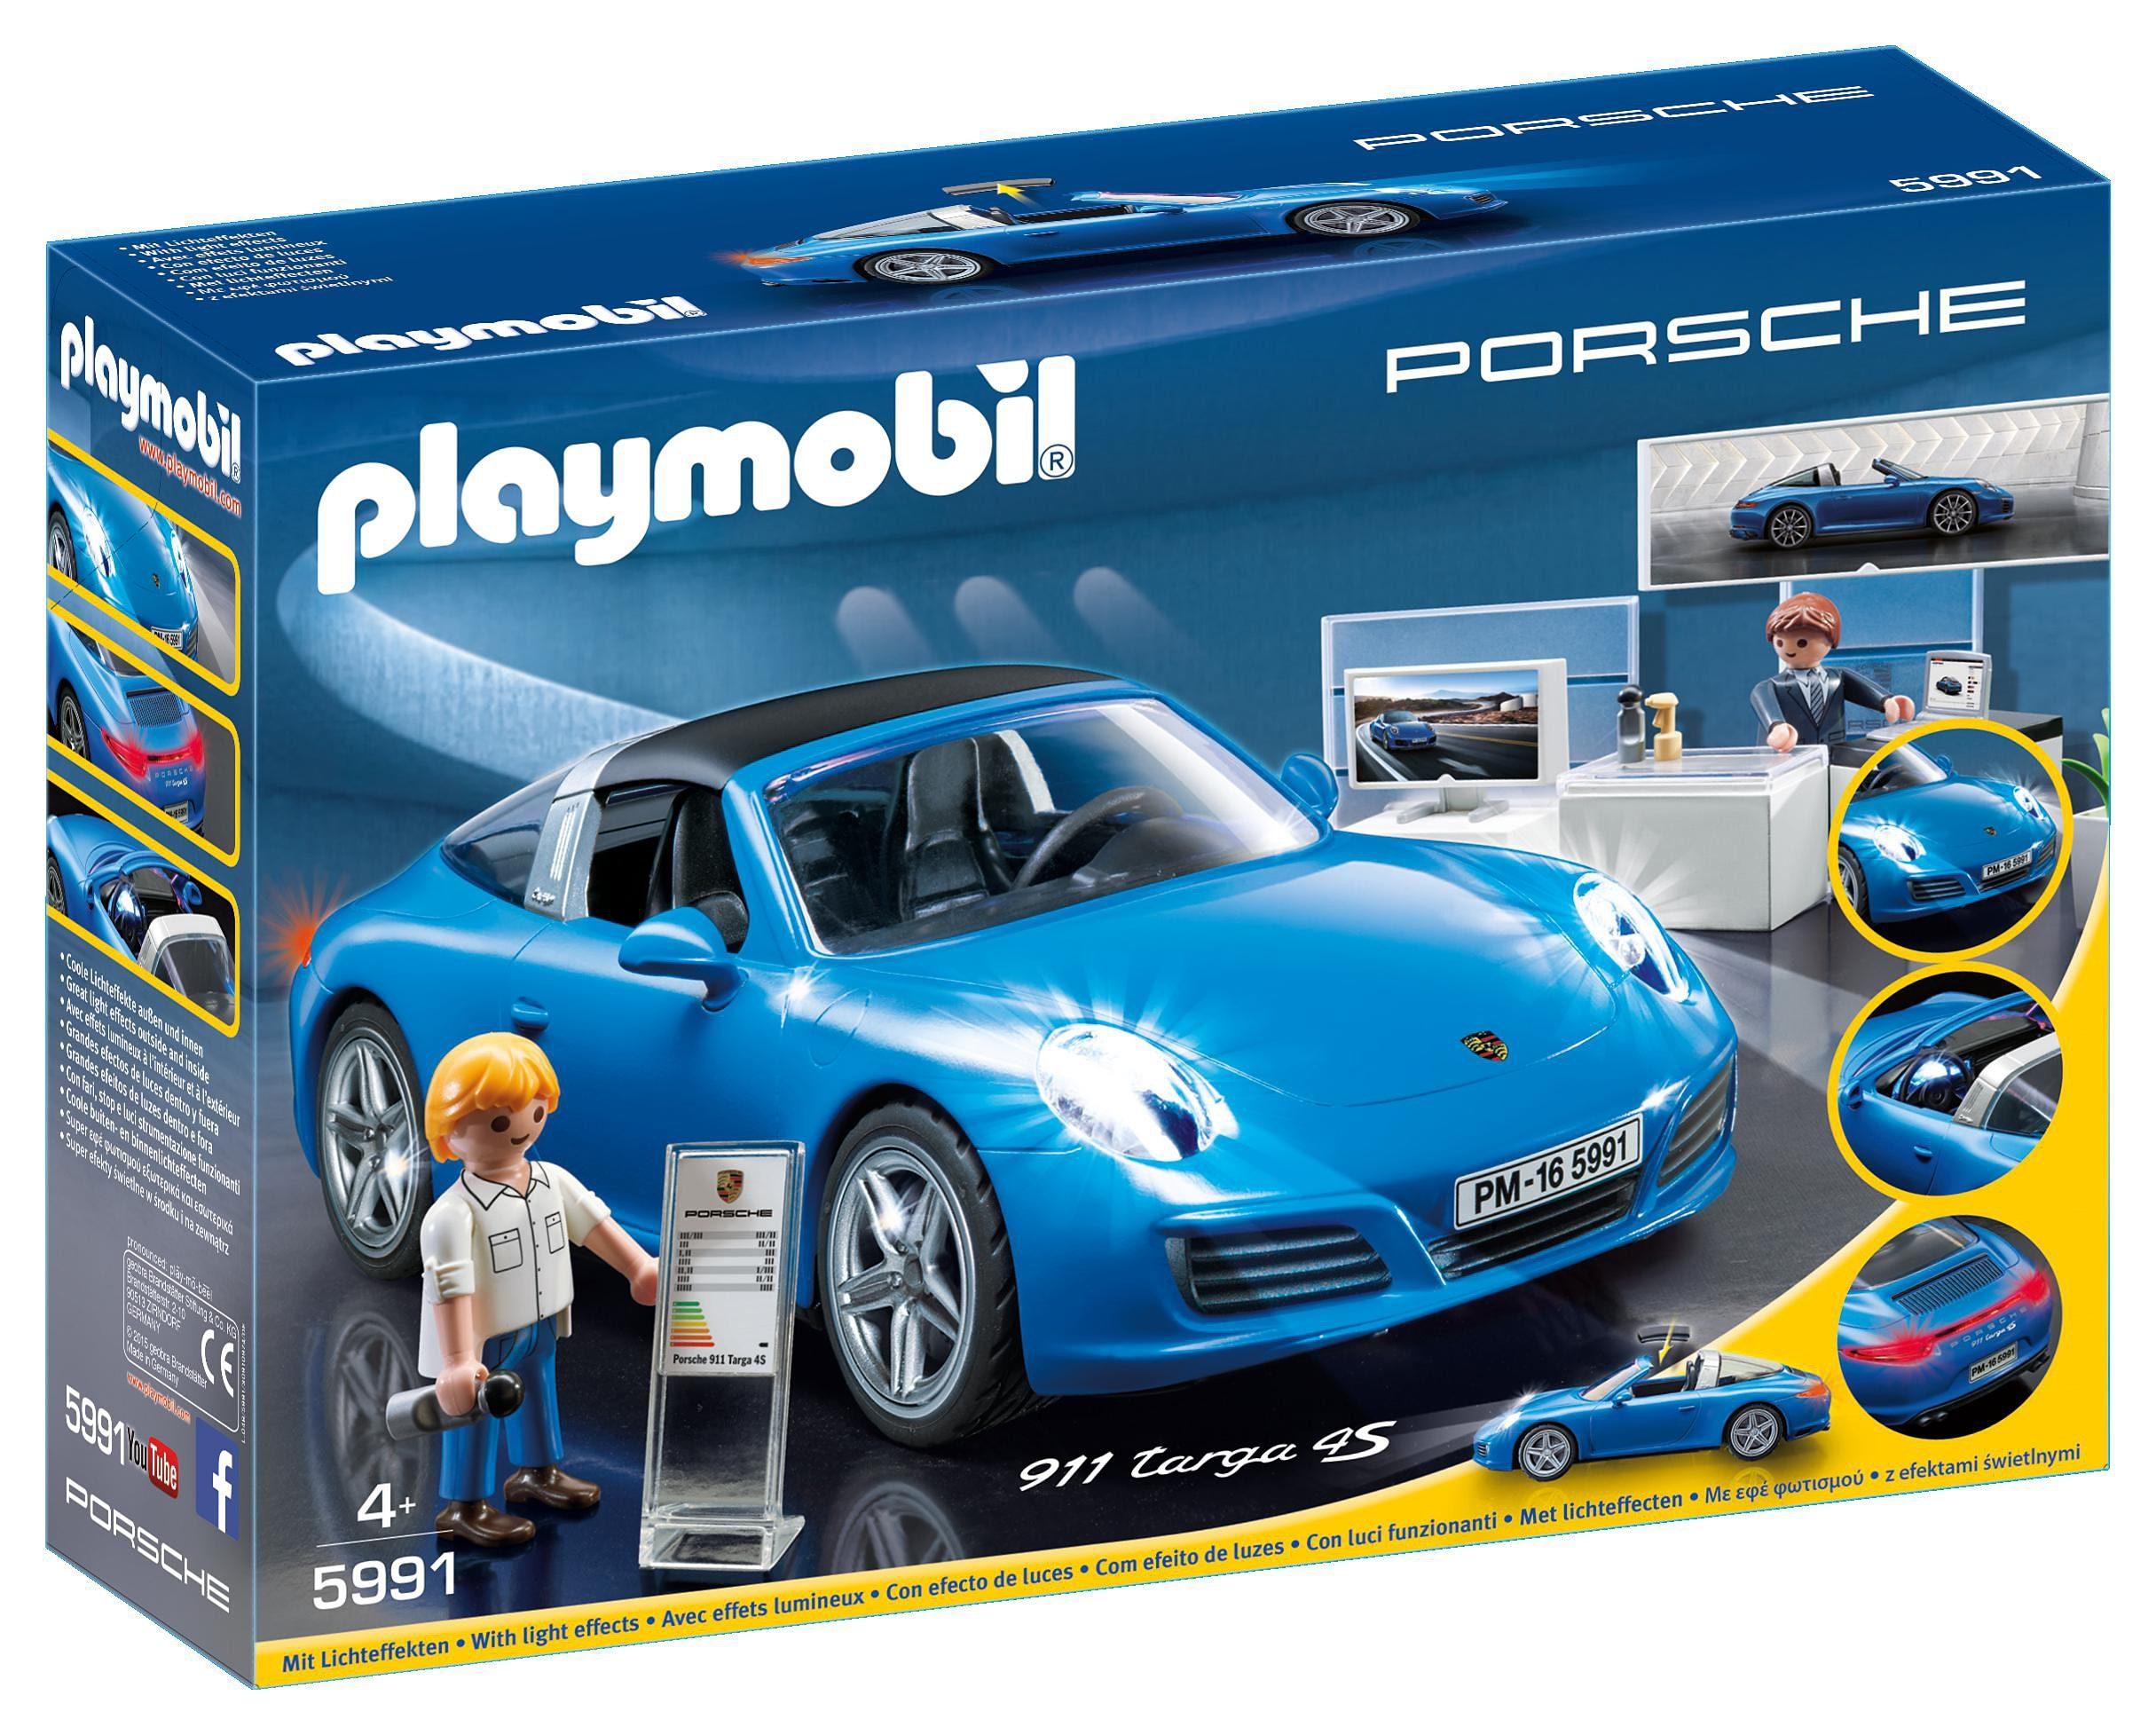 Playmobil® Porsche 911 Targa 4S (5991)